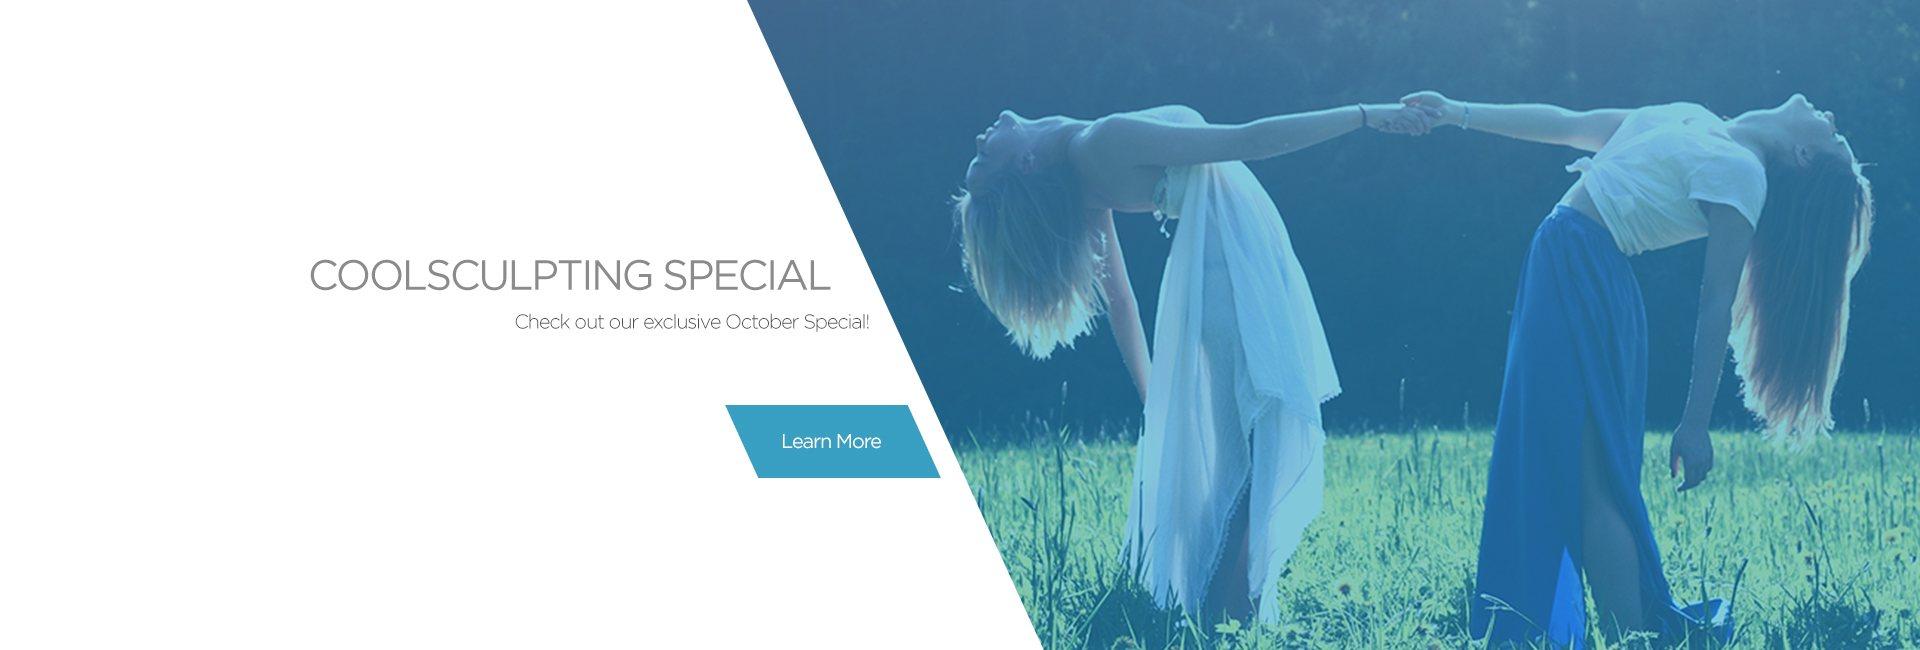 Slider_Pender_October-Special